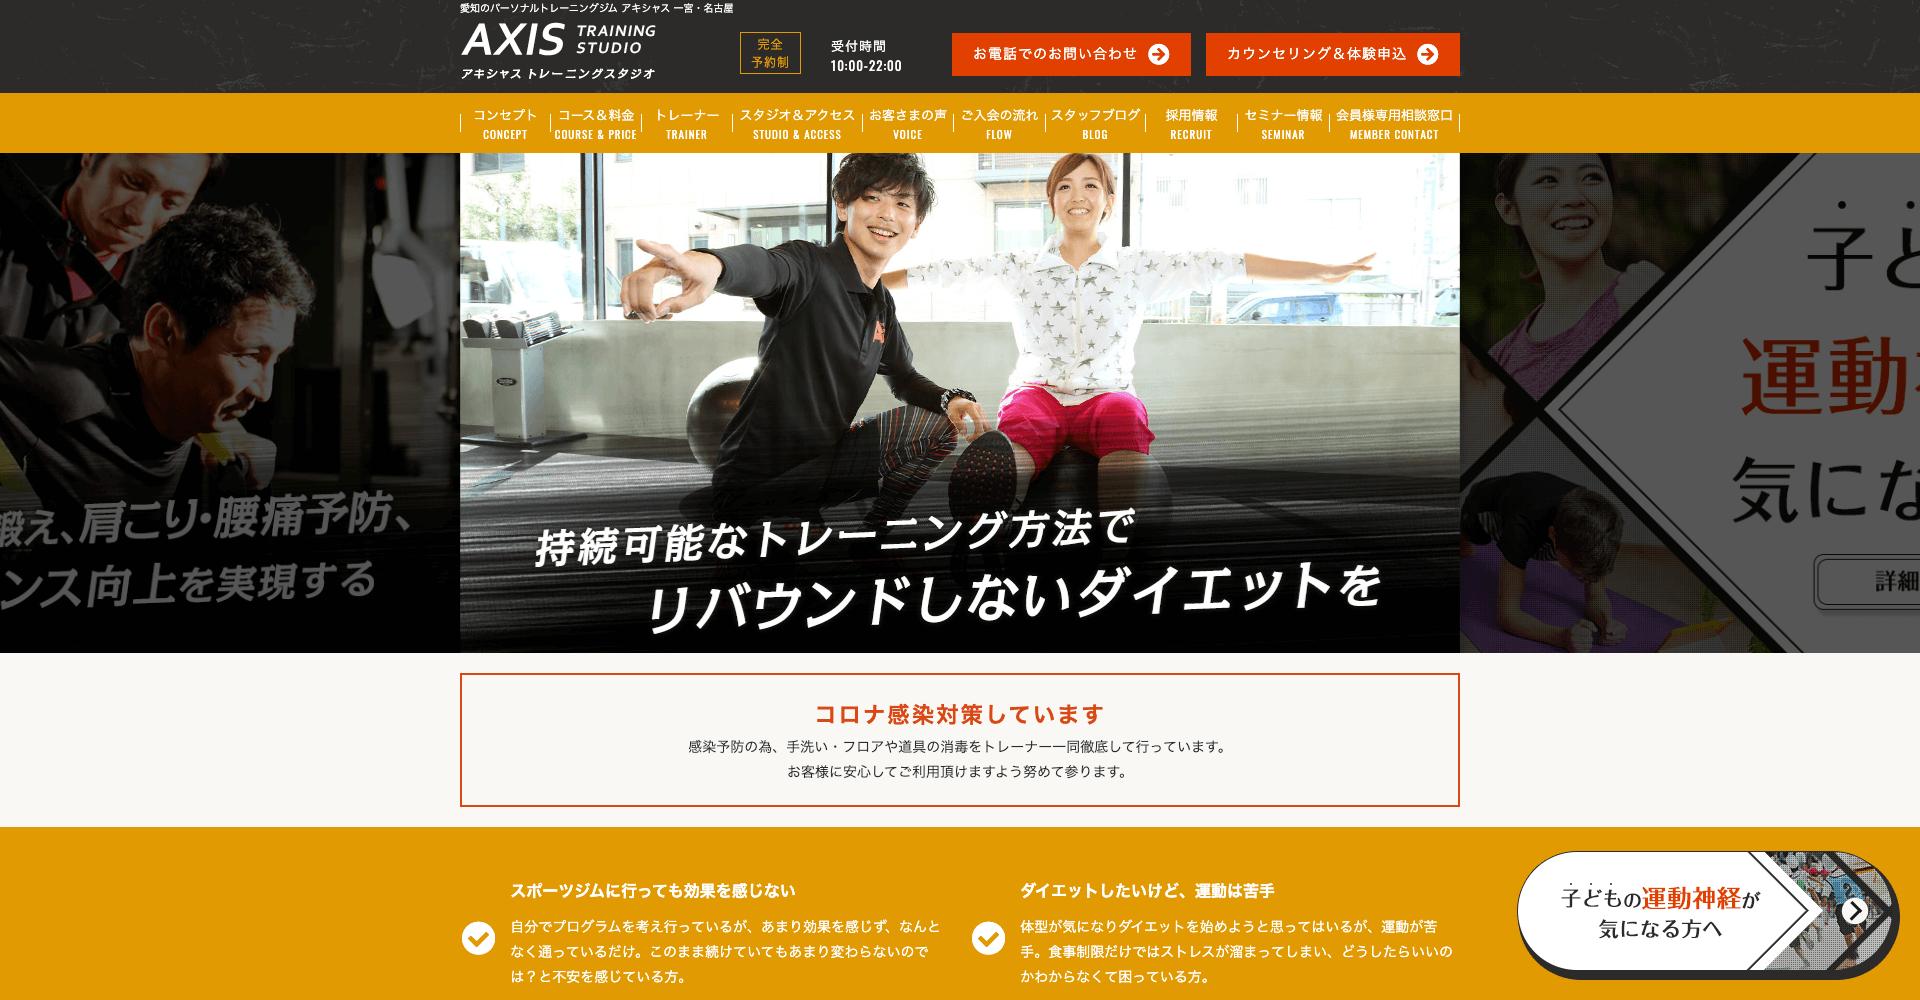 AXIS TRANING STUDIO 神山サテライトスタジオ パーソナルトレーニングジム